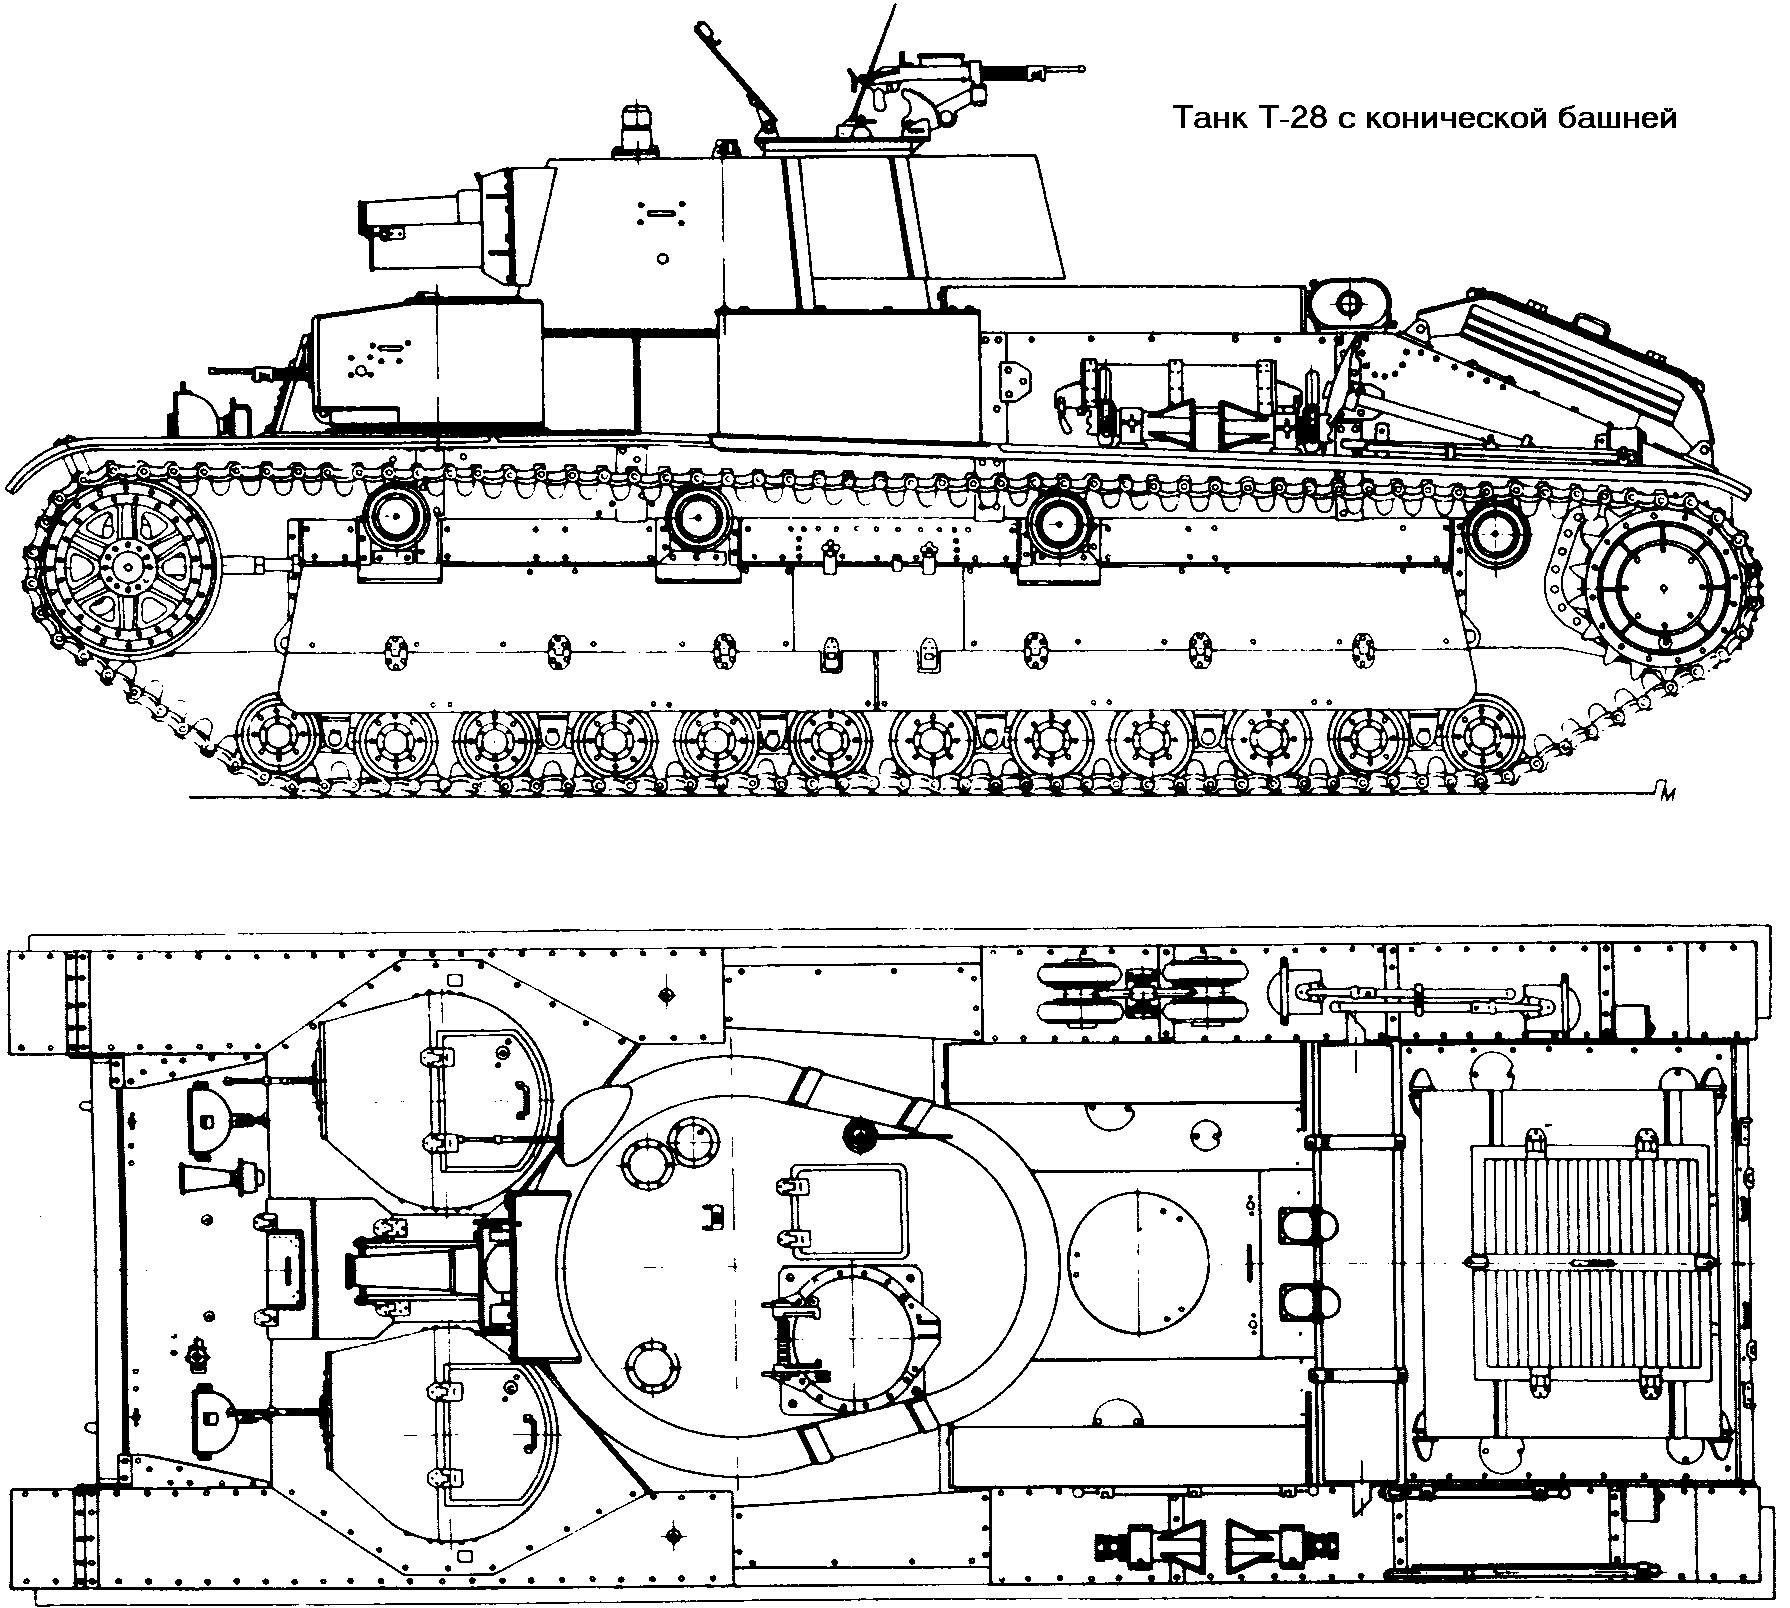 Танк Т-28, чертеж танка с зенитным пулеметом